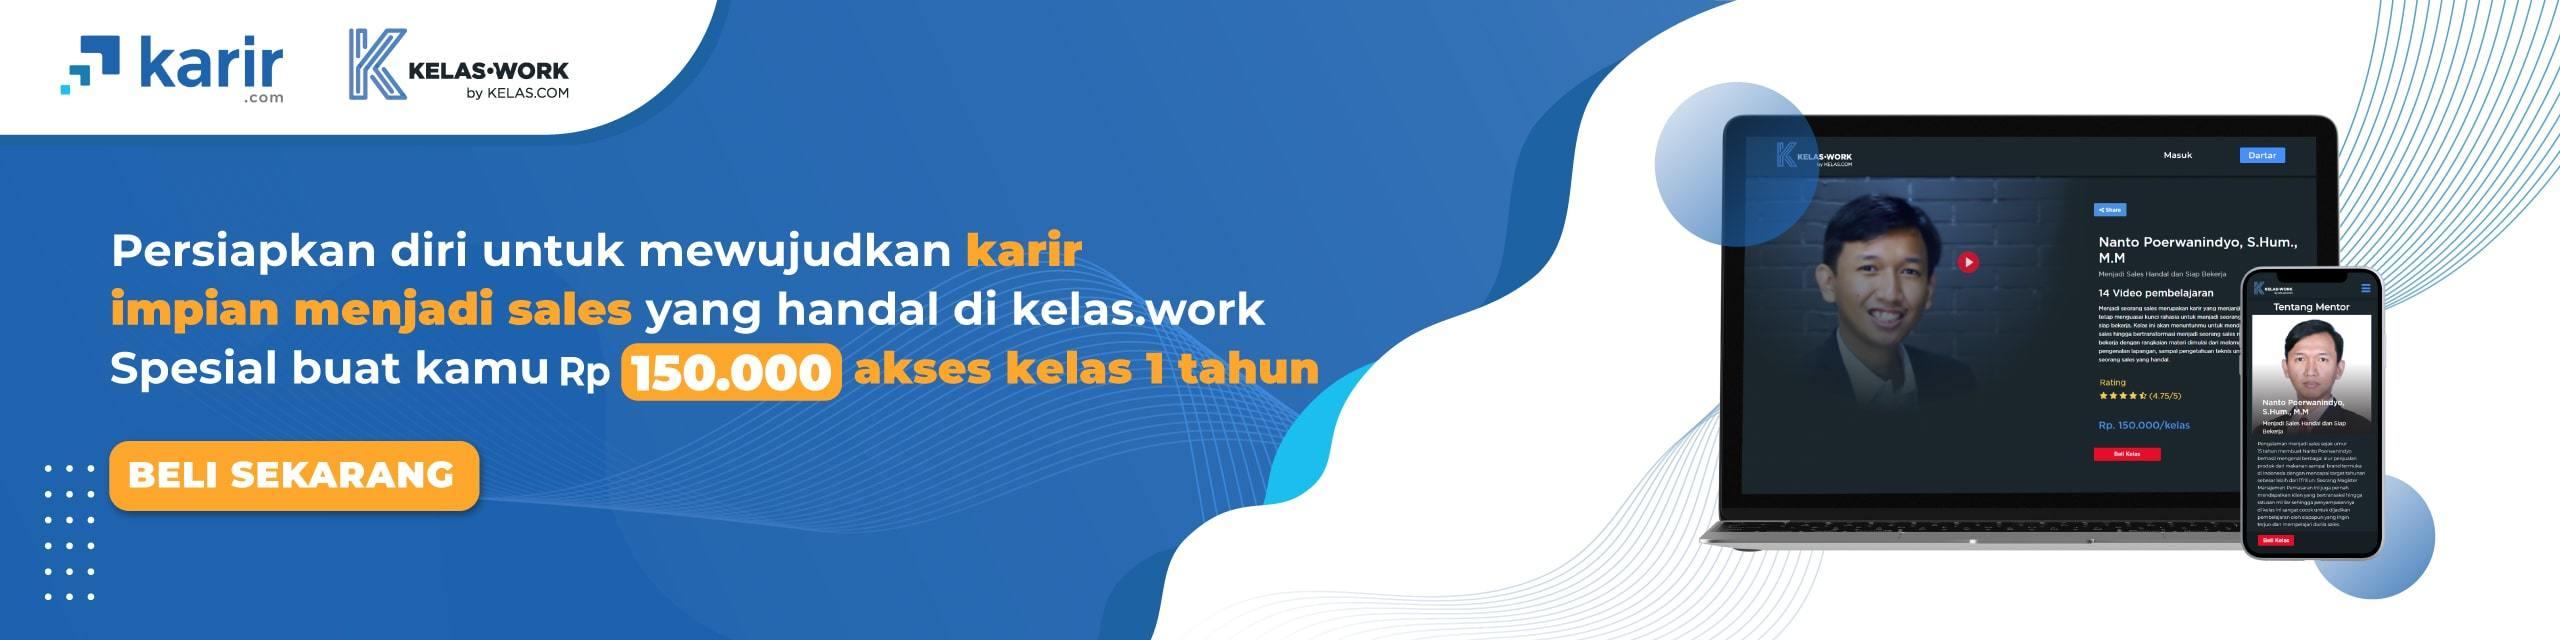 Karir.com desktop min